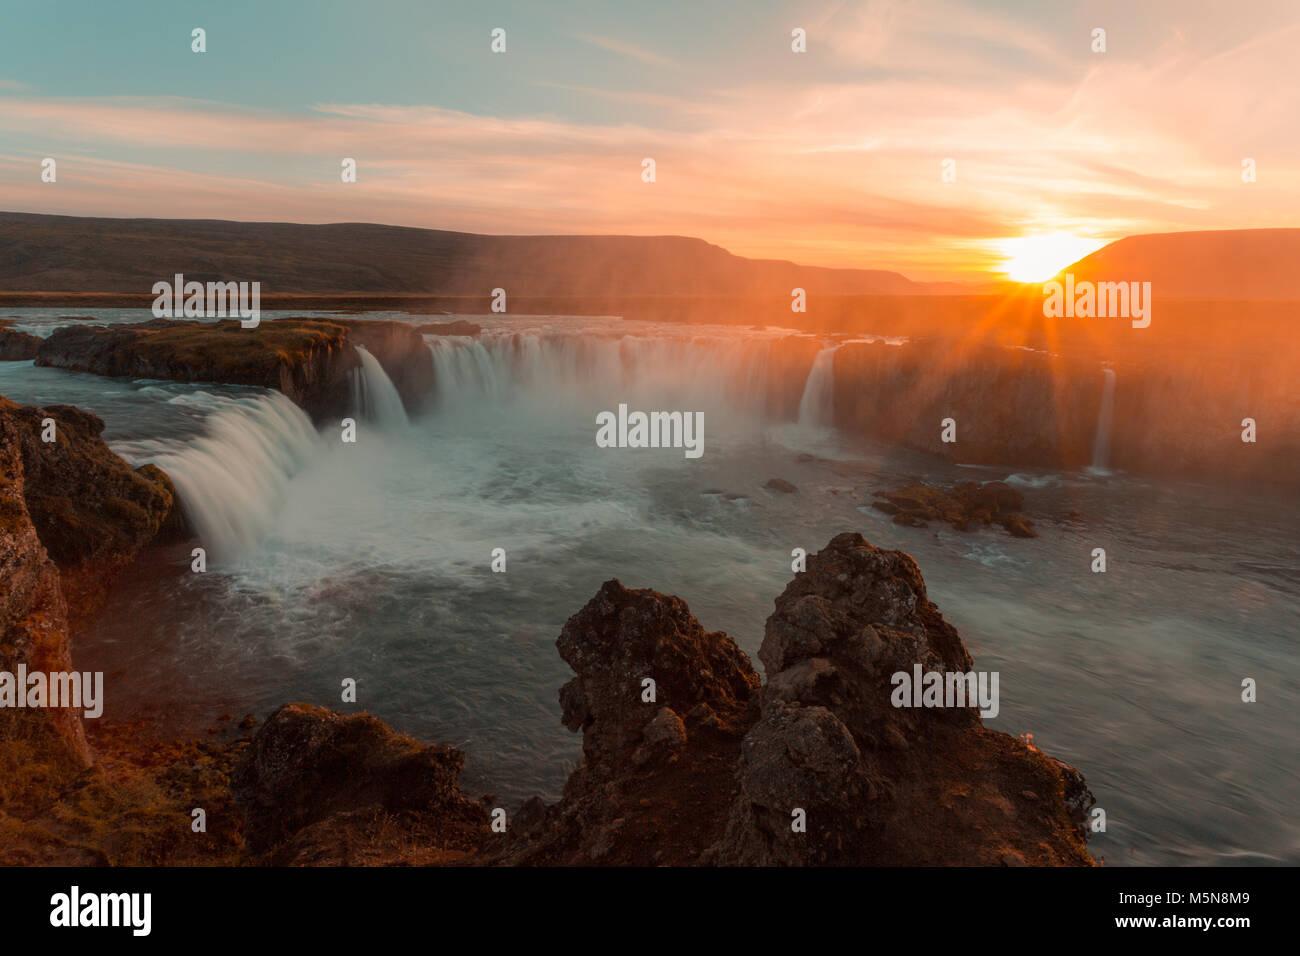 Cascada Godafoss y paisaje, Islandia, Europa Imagen De Stock